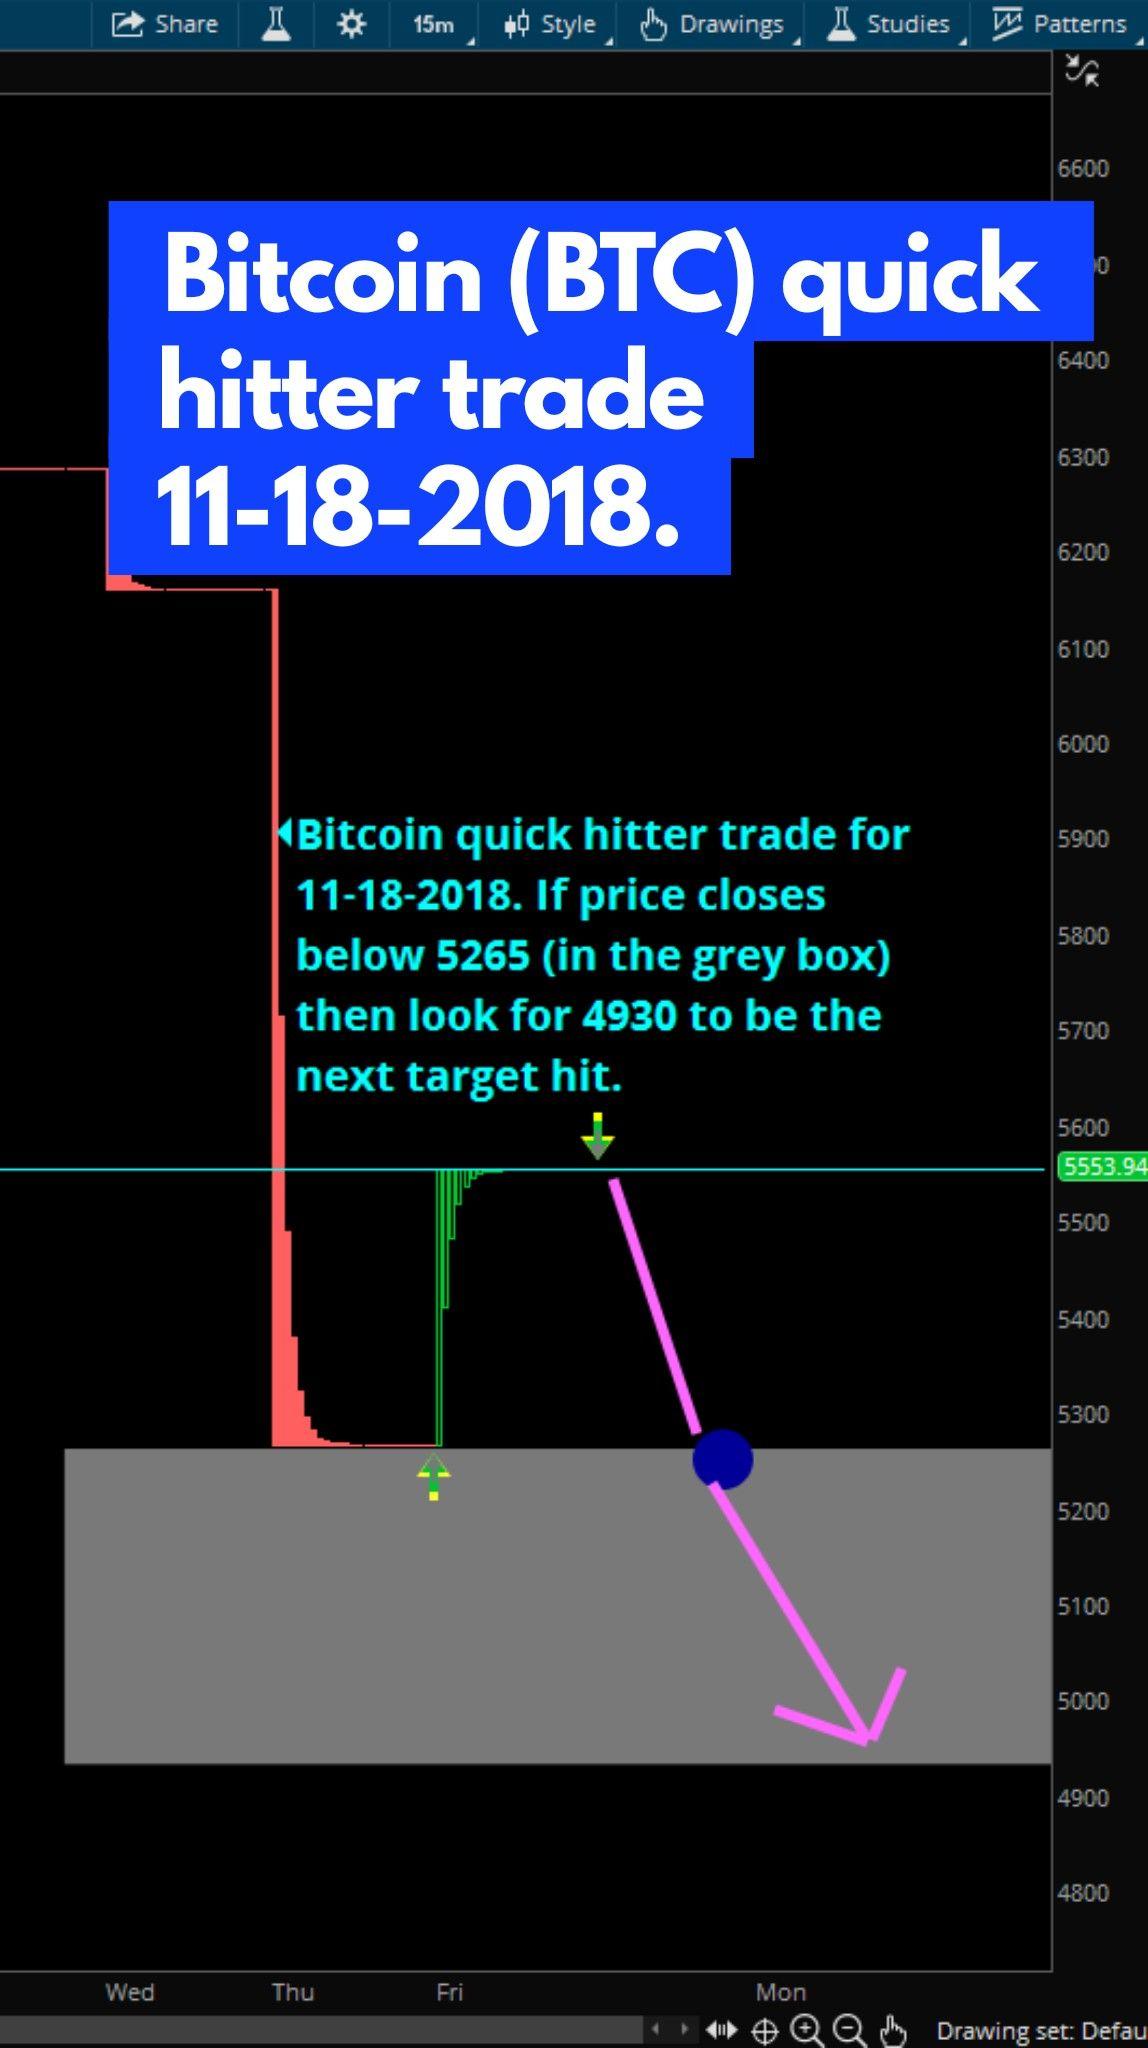 Pin on stocks cryptos forex futures entries and